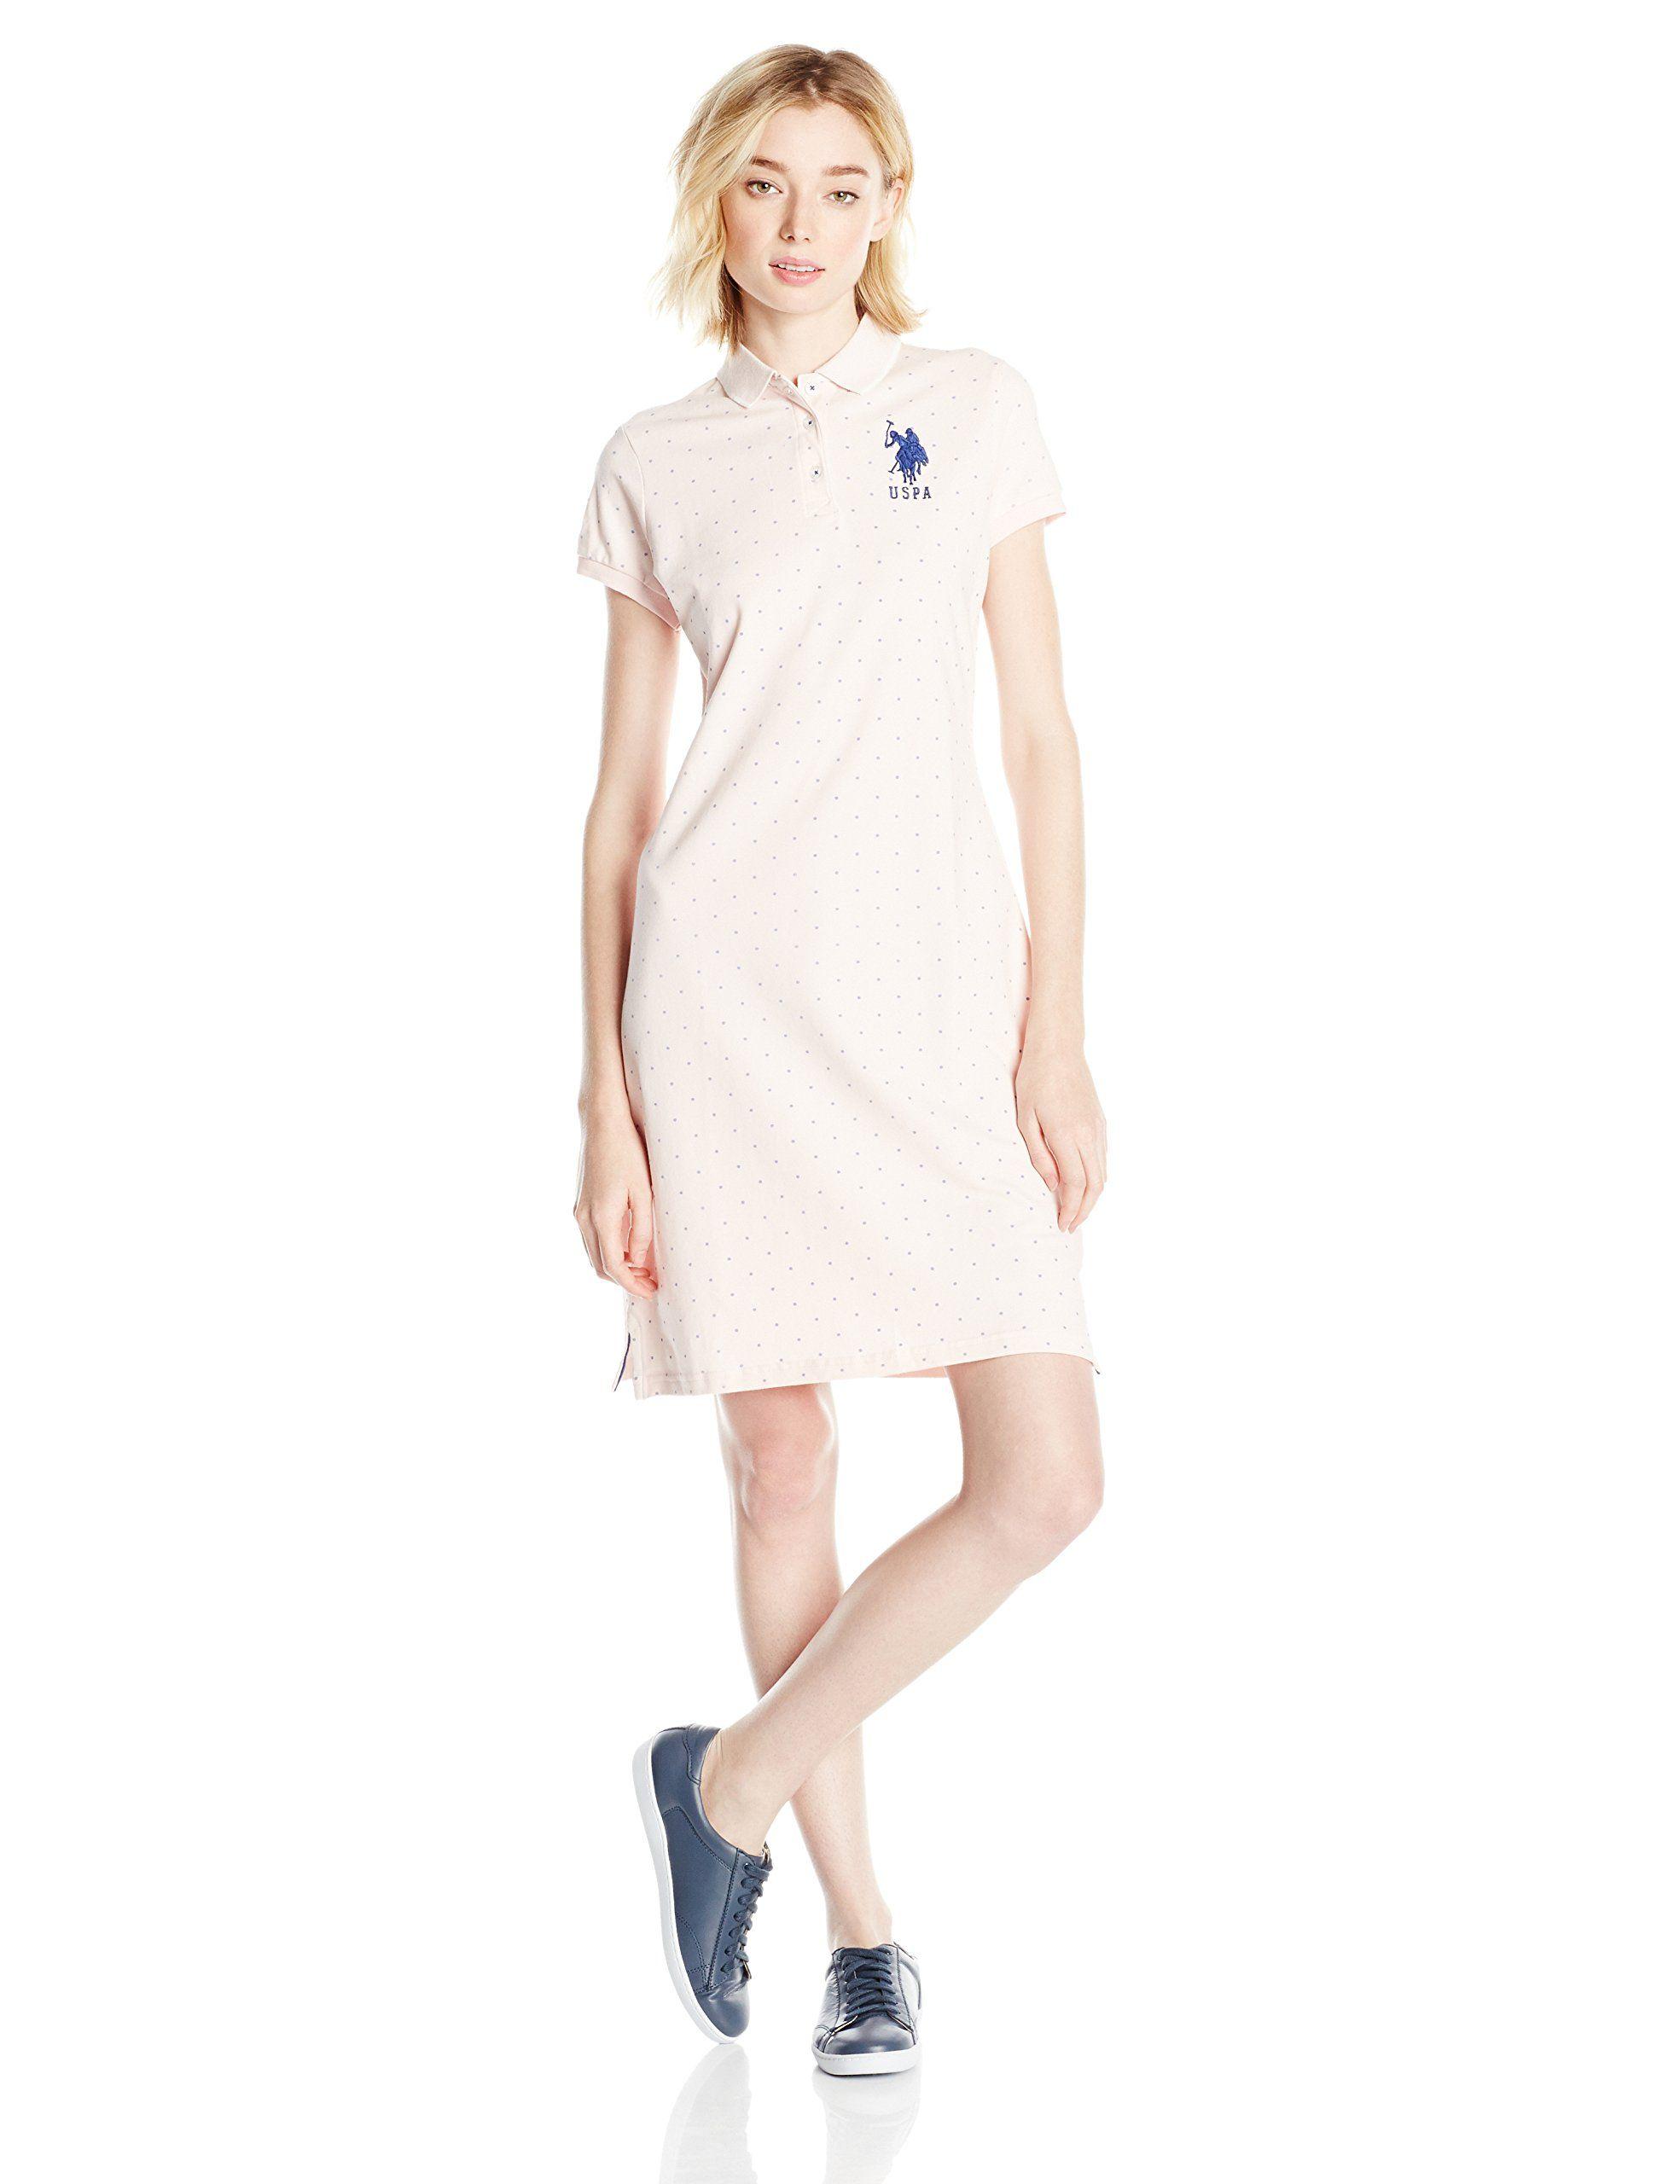 U S Polo Assn Juniors Polka Dot Pique Polo Dress Polo Dress Dresses Fashion